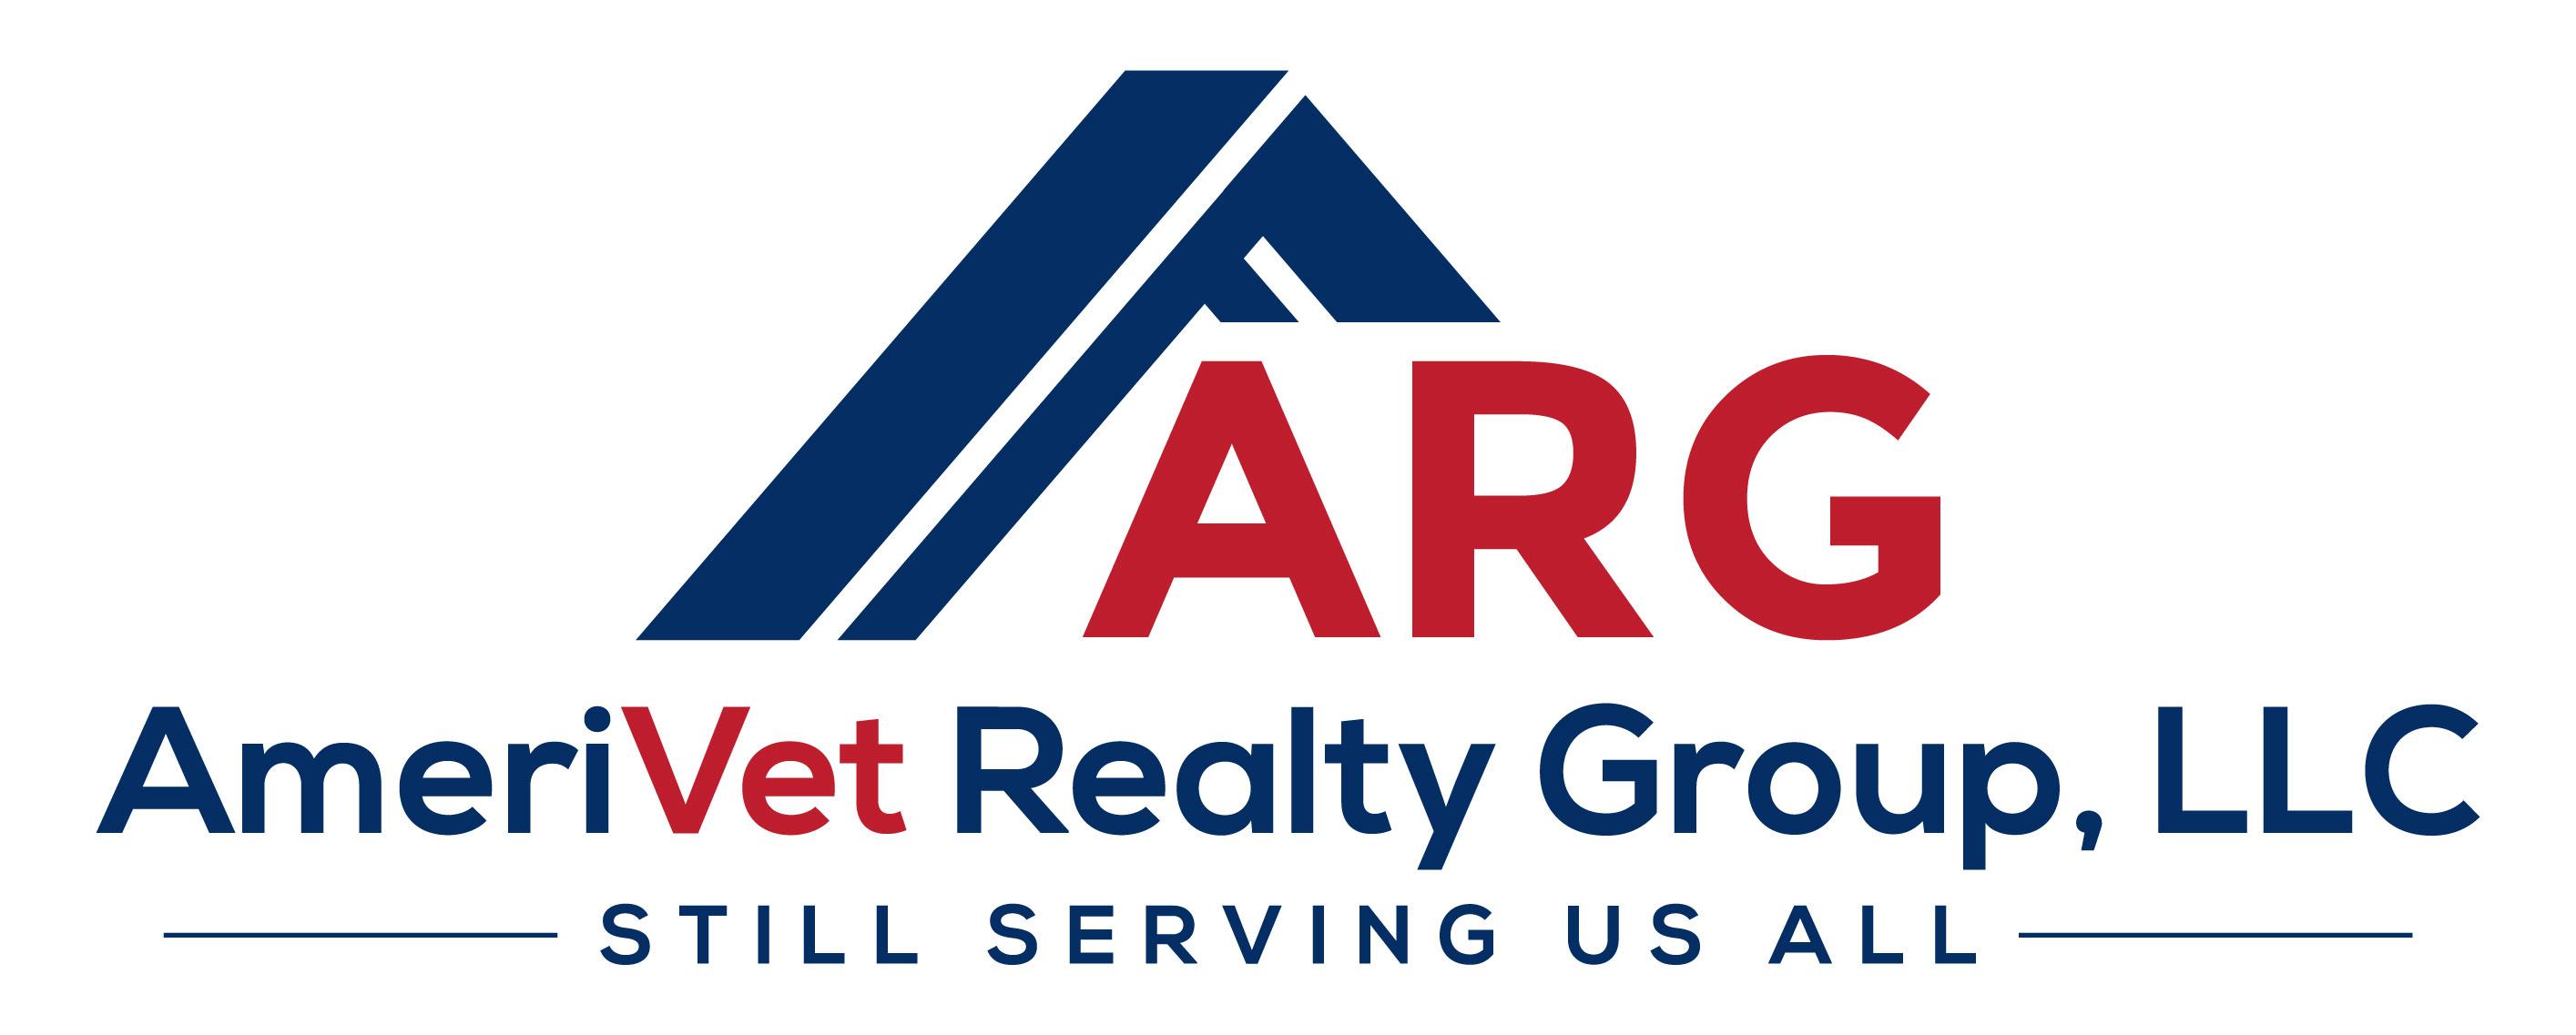 Amerivet Realty Group LLC